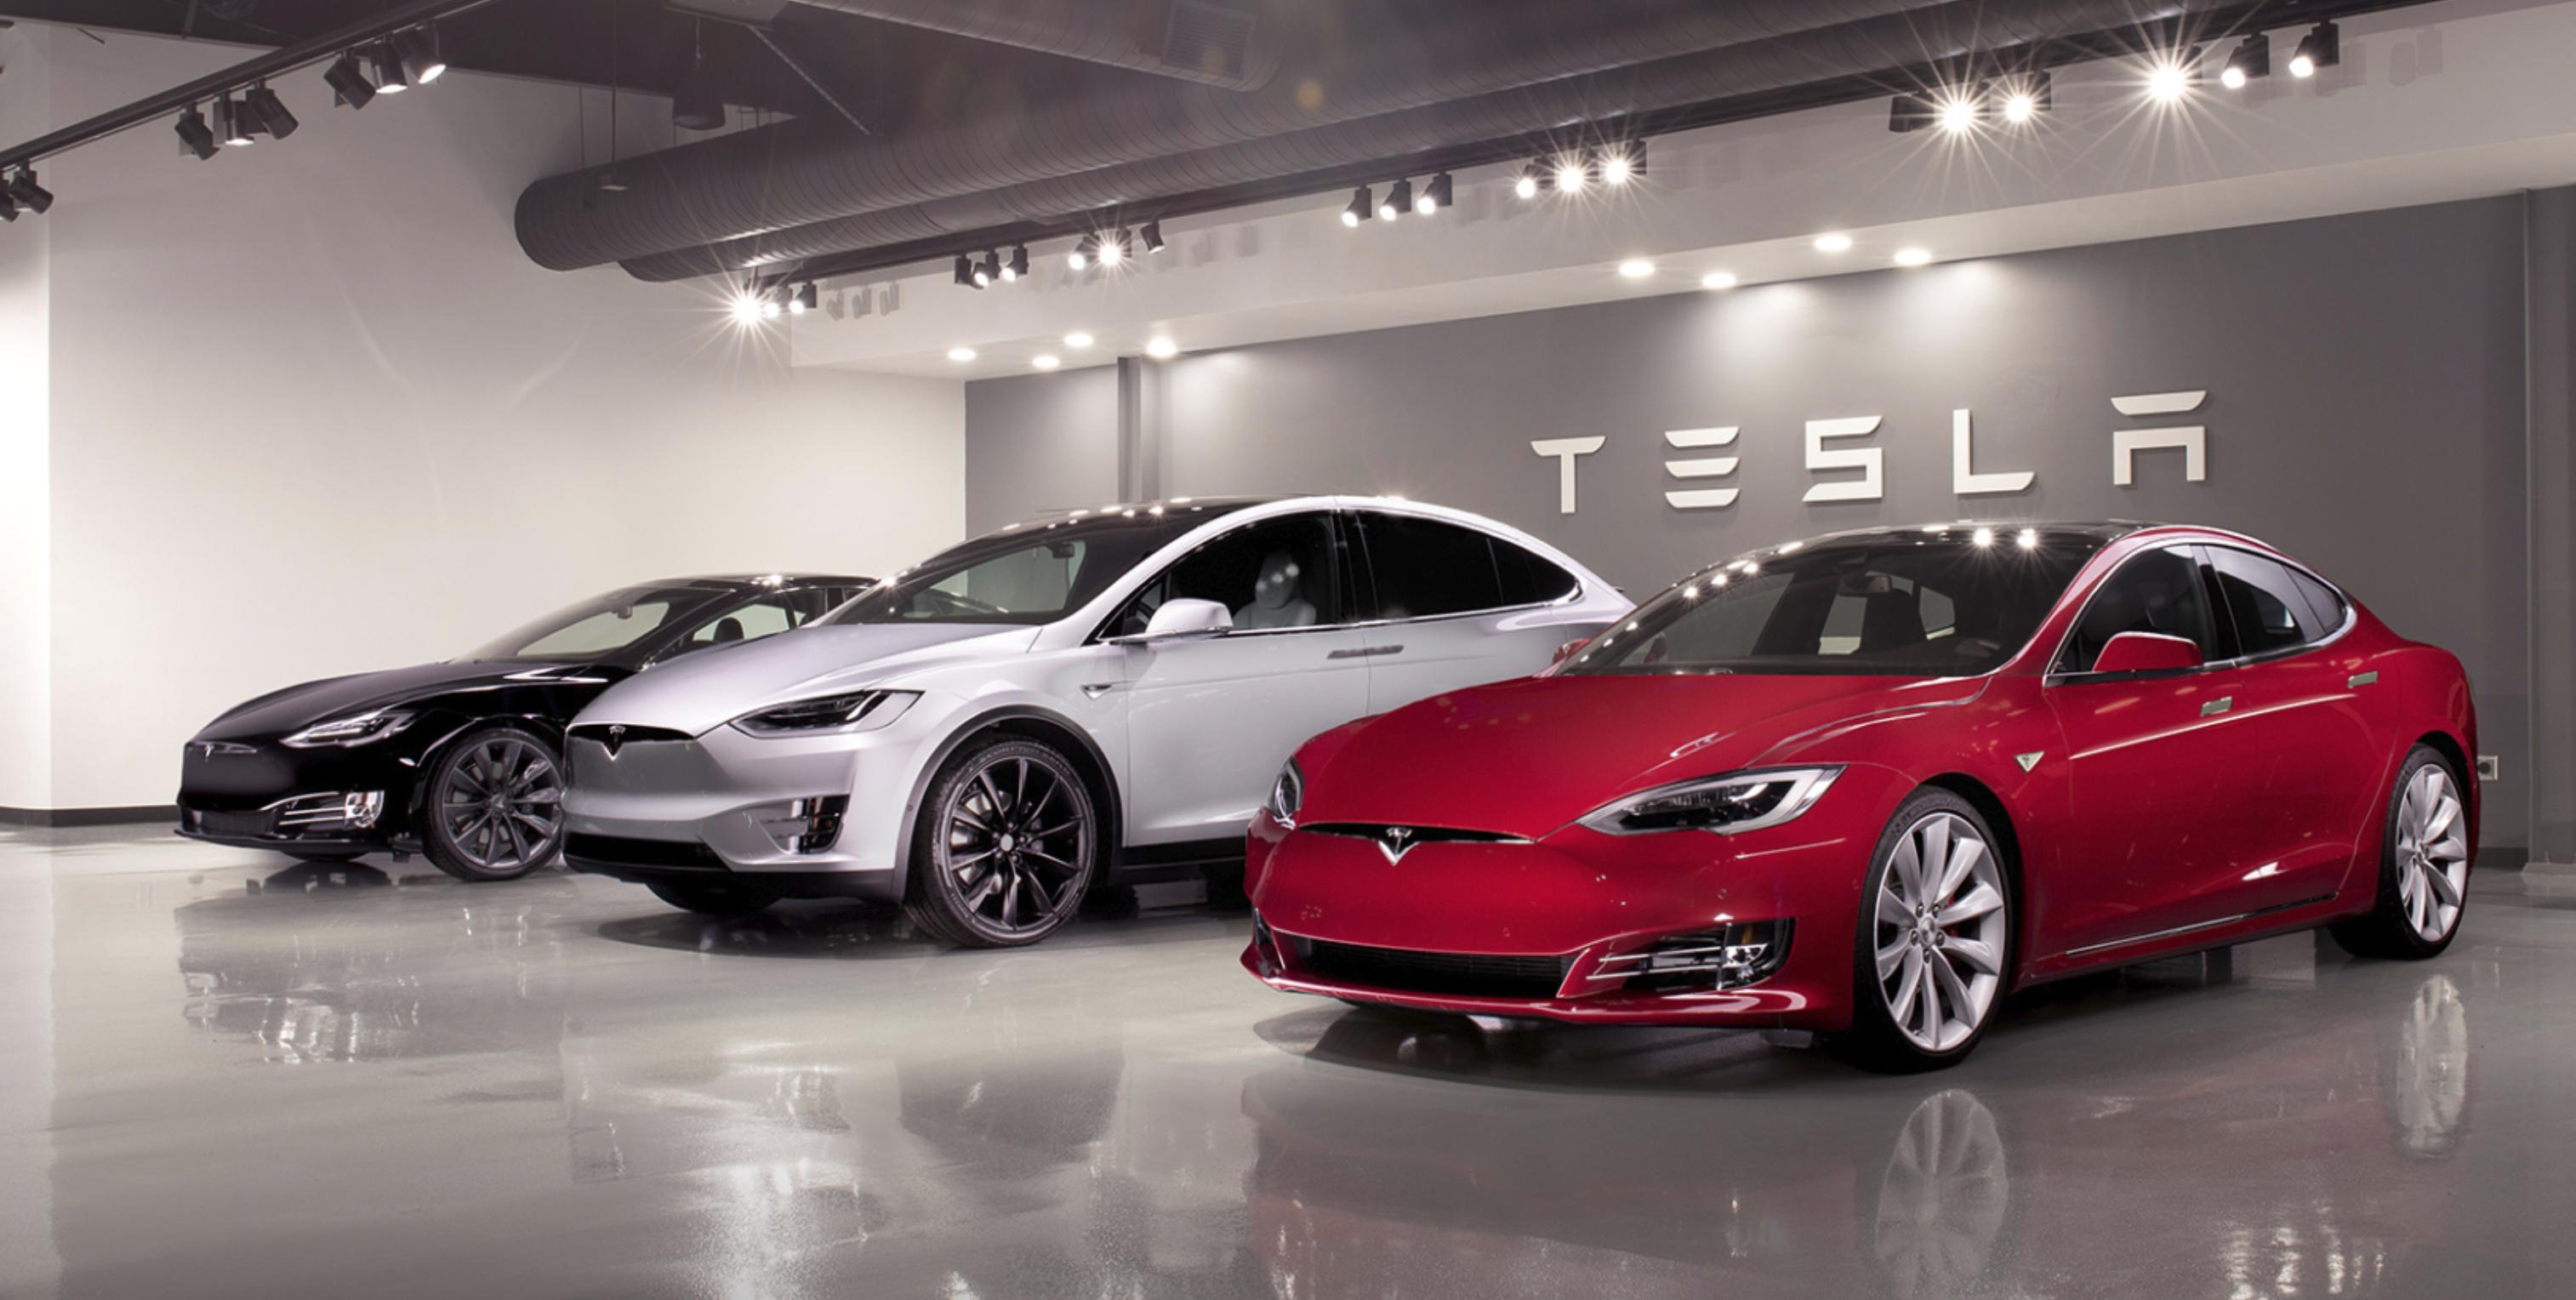 Tesla Model S and X vehicles